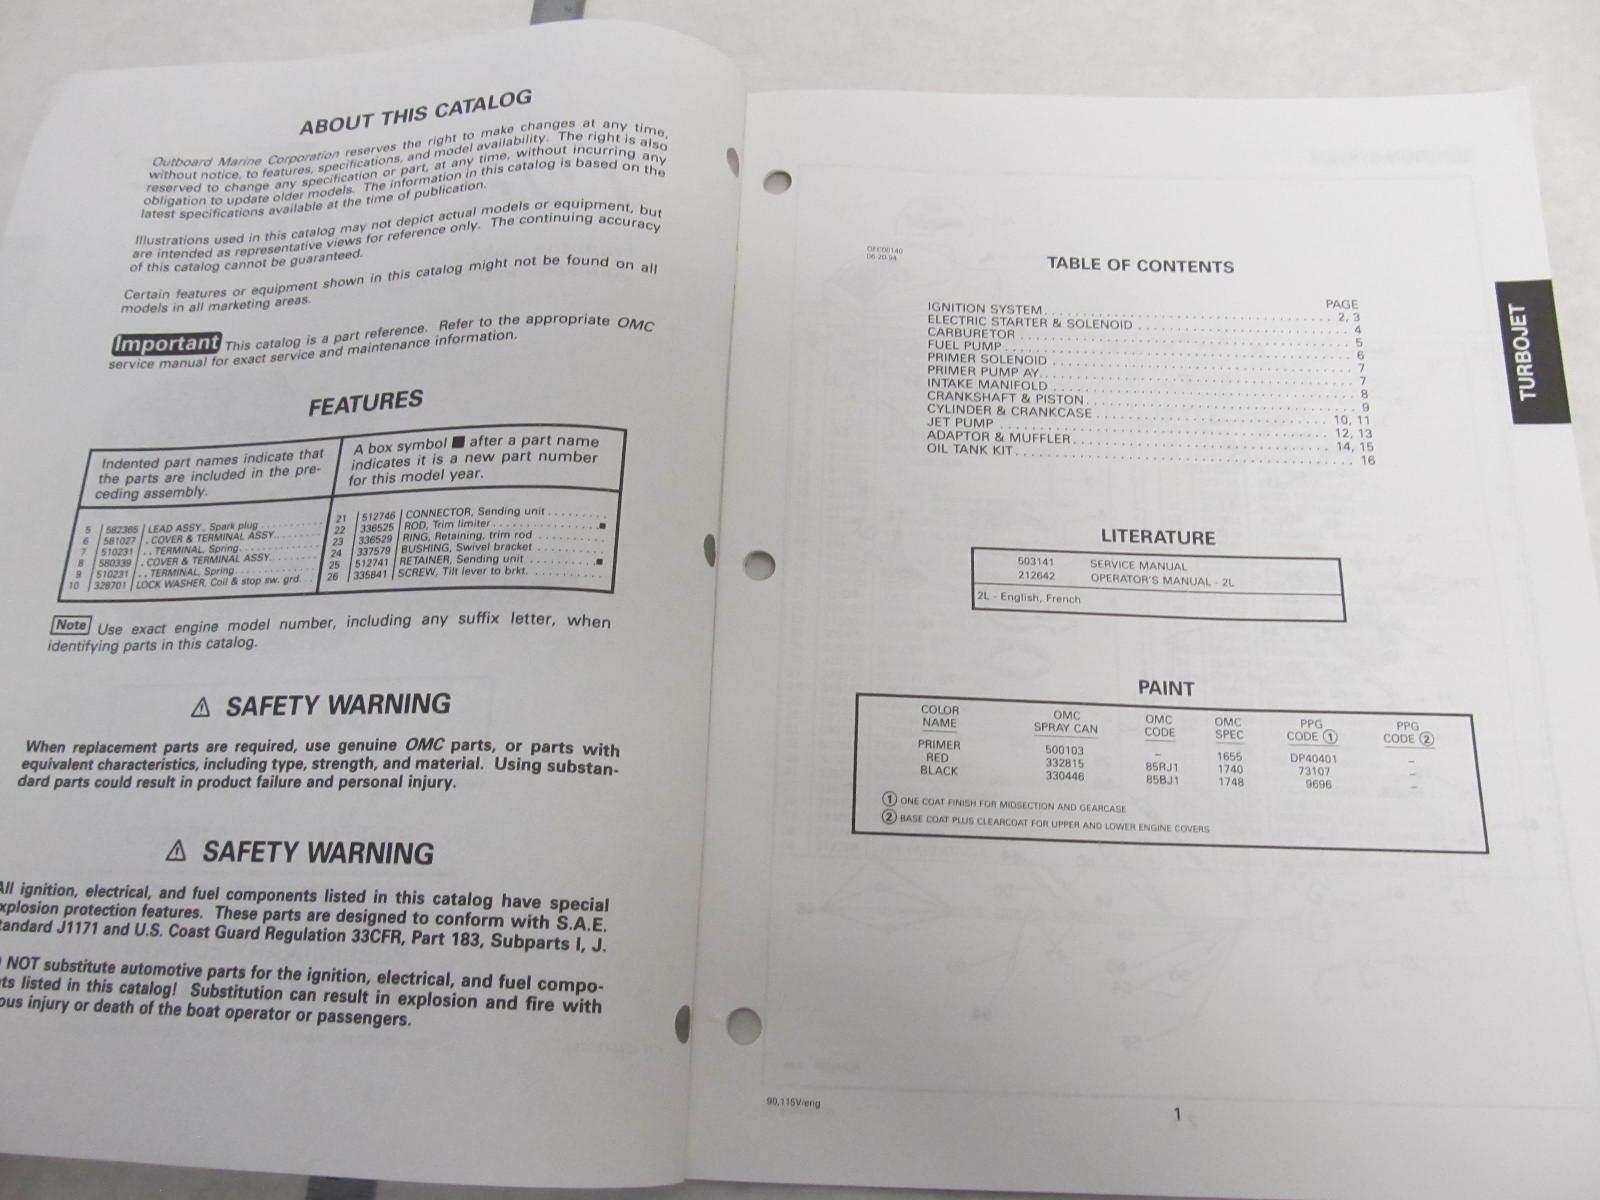 hight resolution of preliminary edition oem er johnson evinrude parts catalog hi boaters comments closed omc 115 turbojet service manual 1994 johnson evinrude er cv 85